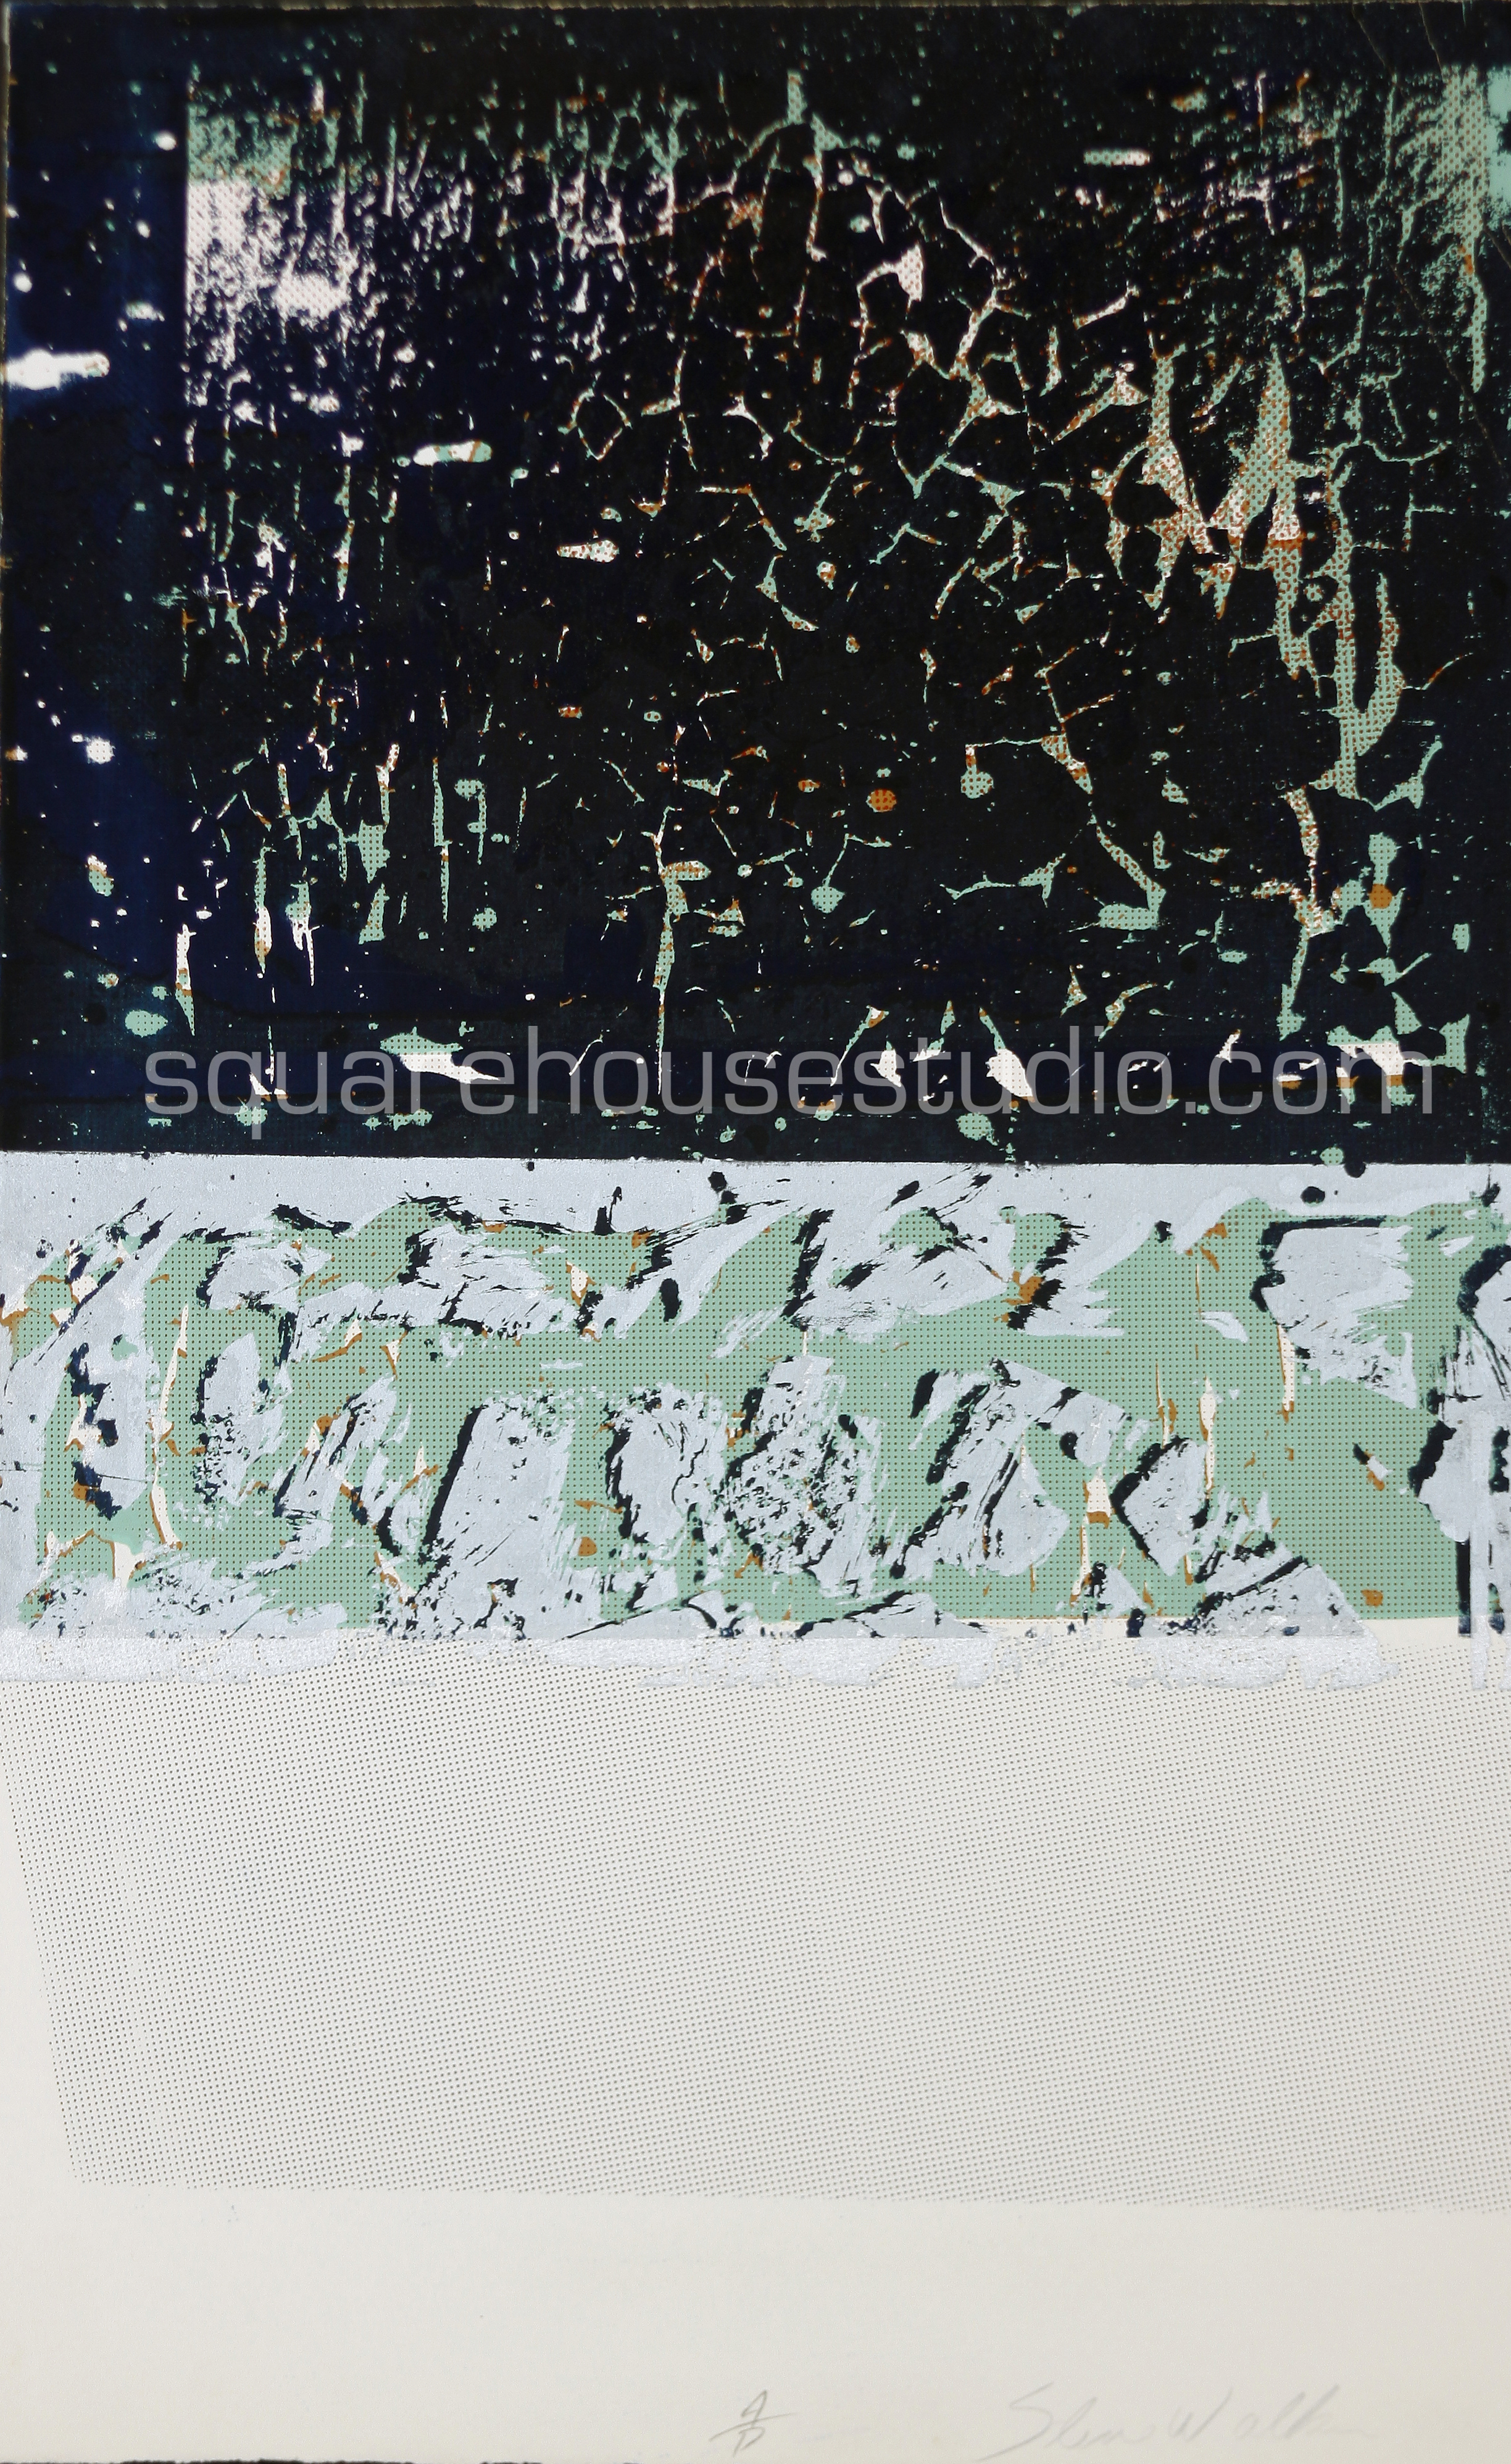 "Starry Night , 22"" x 32,"" original edition, $625 framed / $475 unframed, Available as giclée print—$450 framed / $300 unframed"